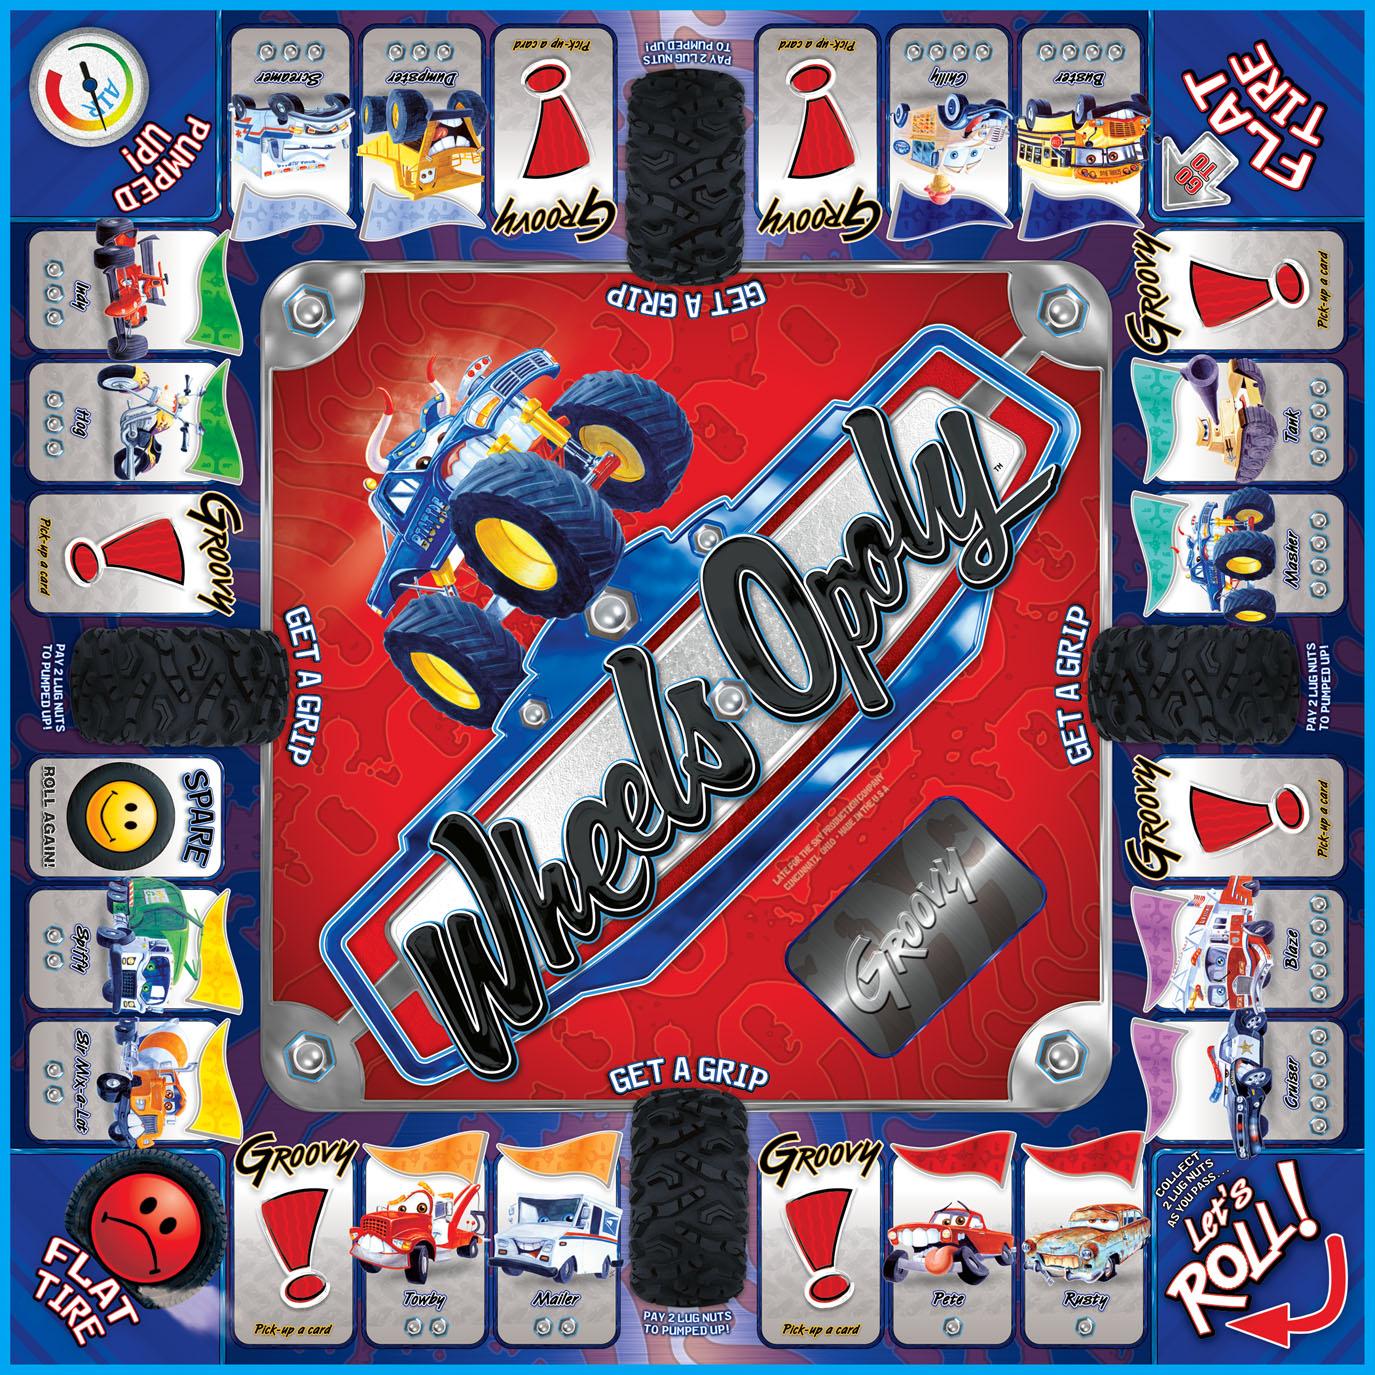 WHEELS-OPOLY Board Game